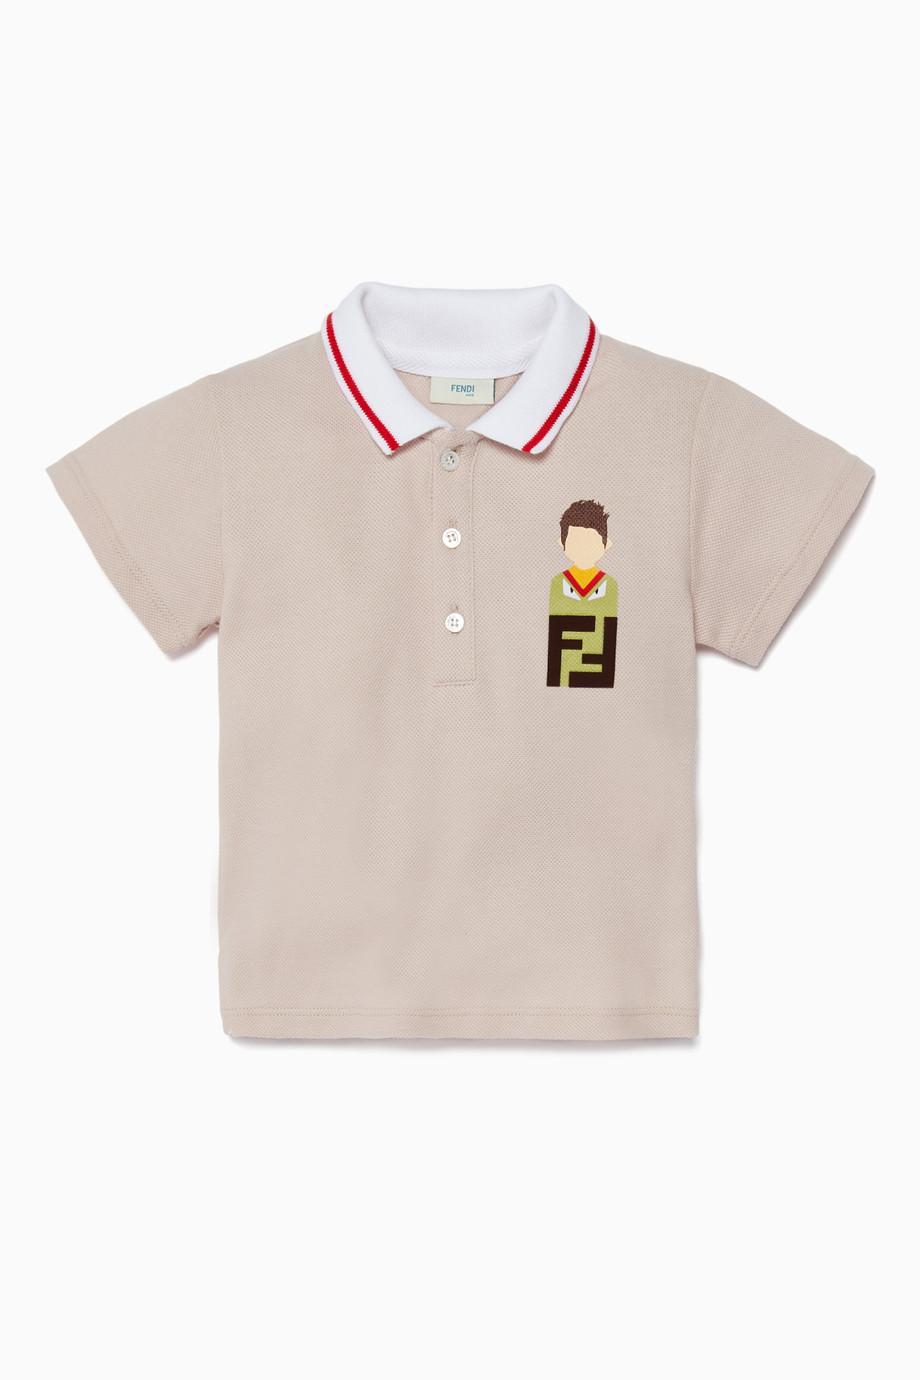 c6e59714a0db2 تسوق تي شيرت بولو بطبعة بيج Fendi لون طبيعى للأطفال